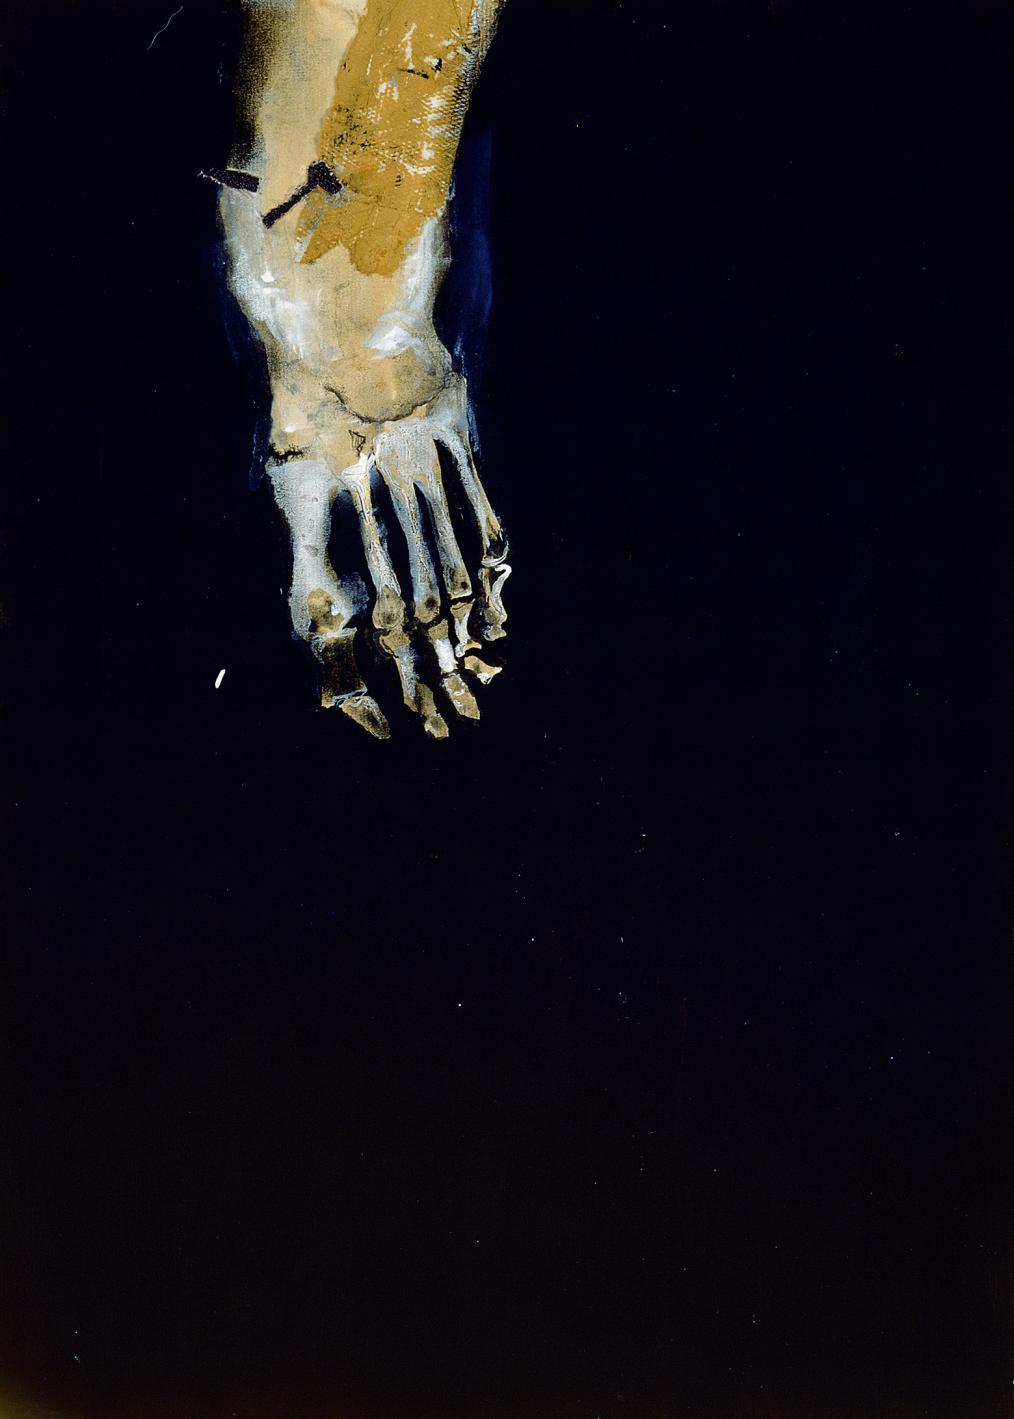 Almagrafía nº 18 (2005) - Rossana Zaera Clausell